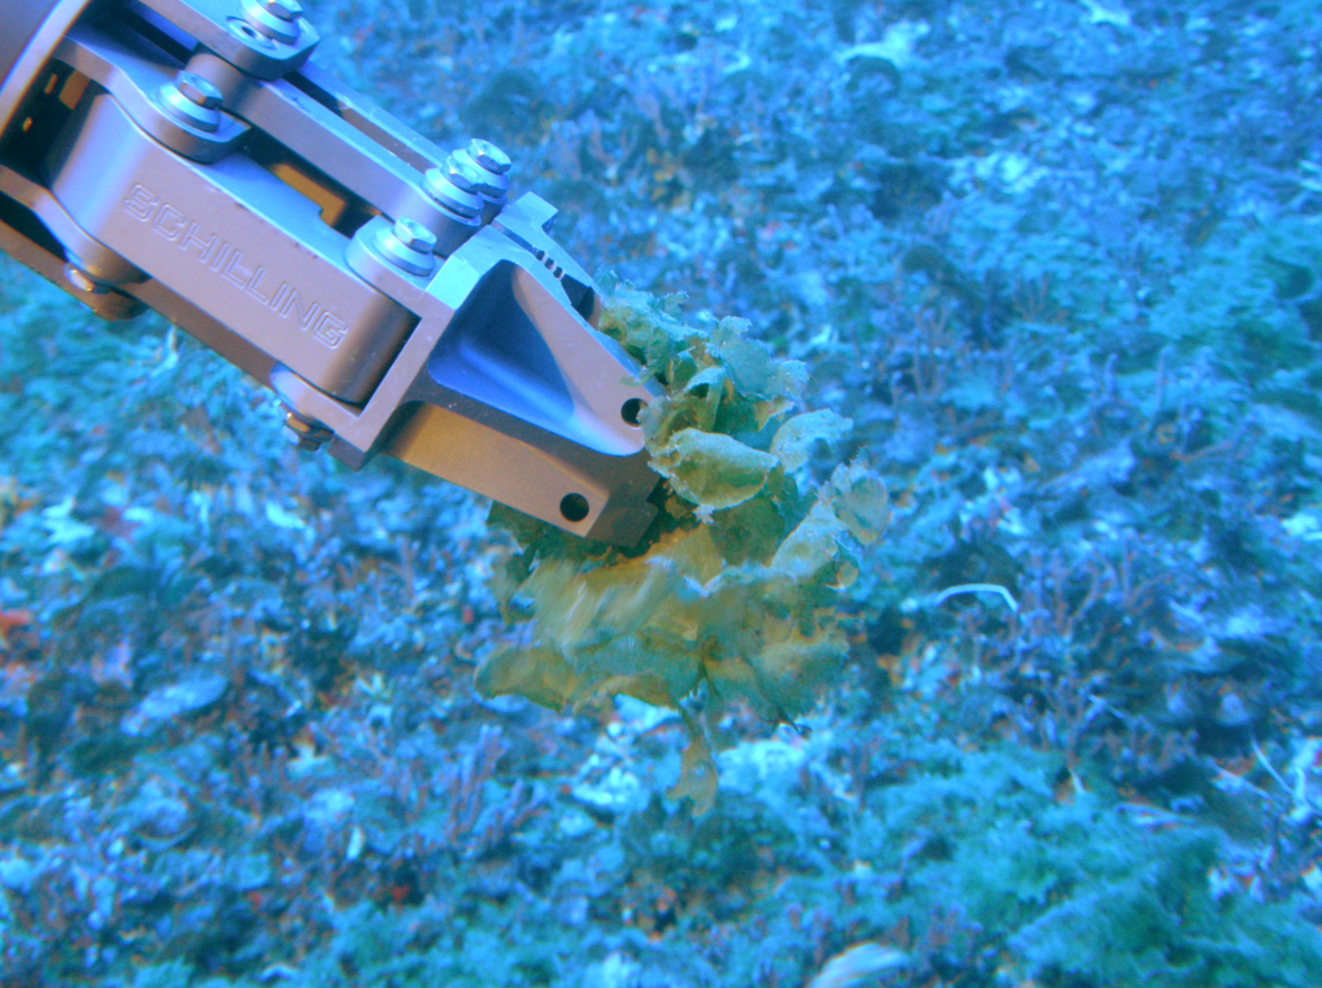 The algae  Microdictyon umbilicatum  being sampled. Wainwright et al. 2017.